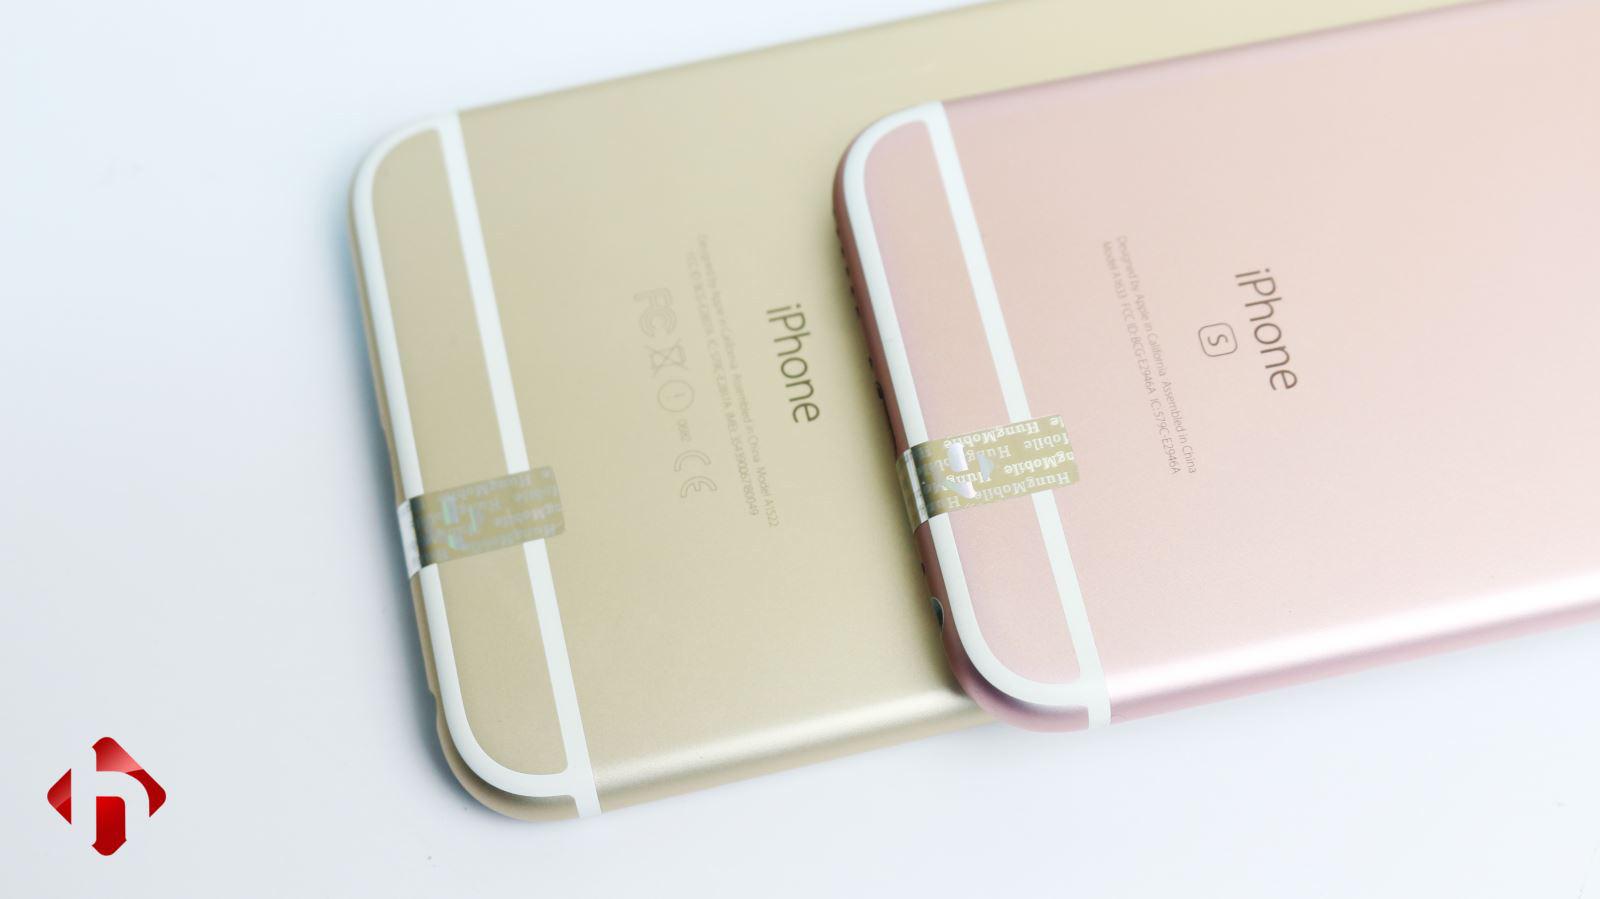 Đuôi máy iPhone 6s, 6s Plus